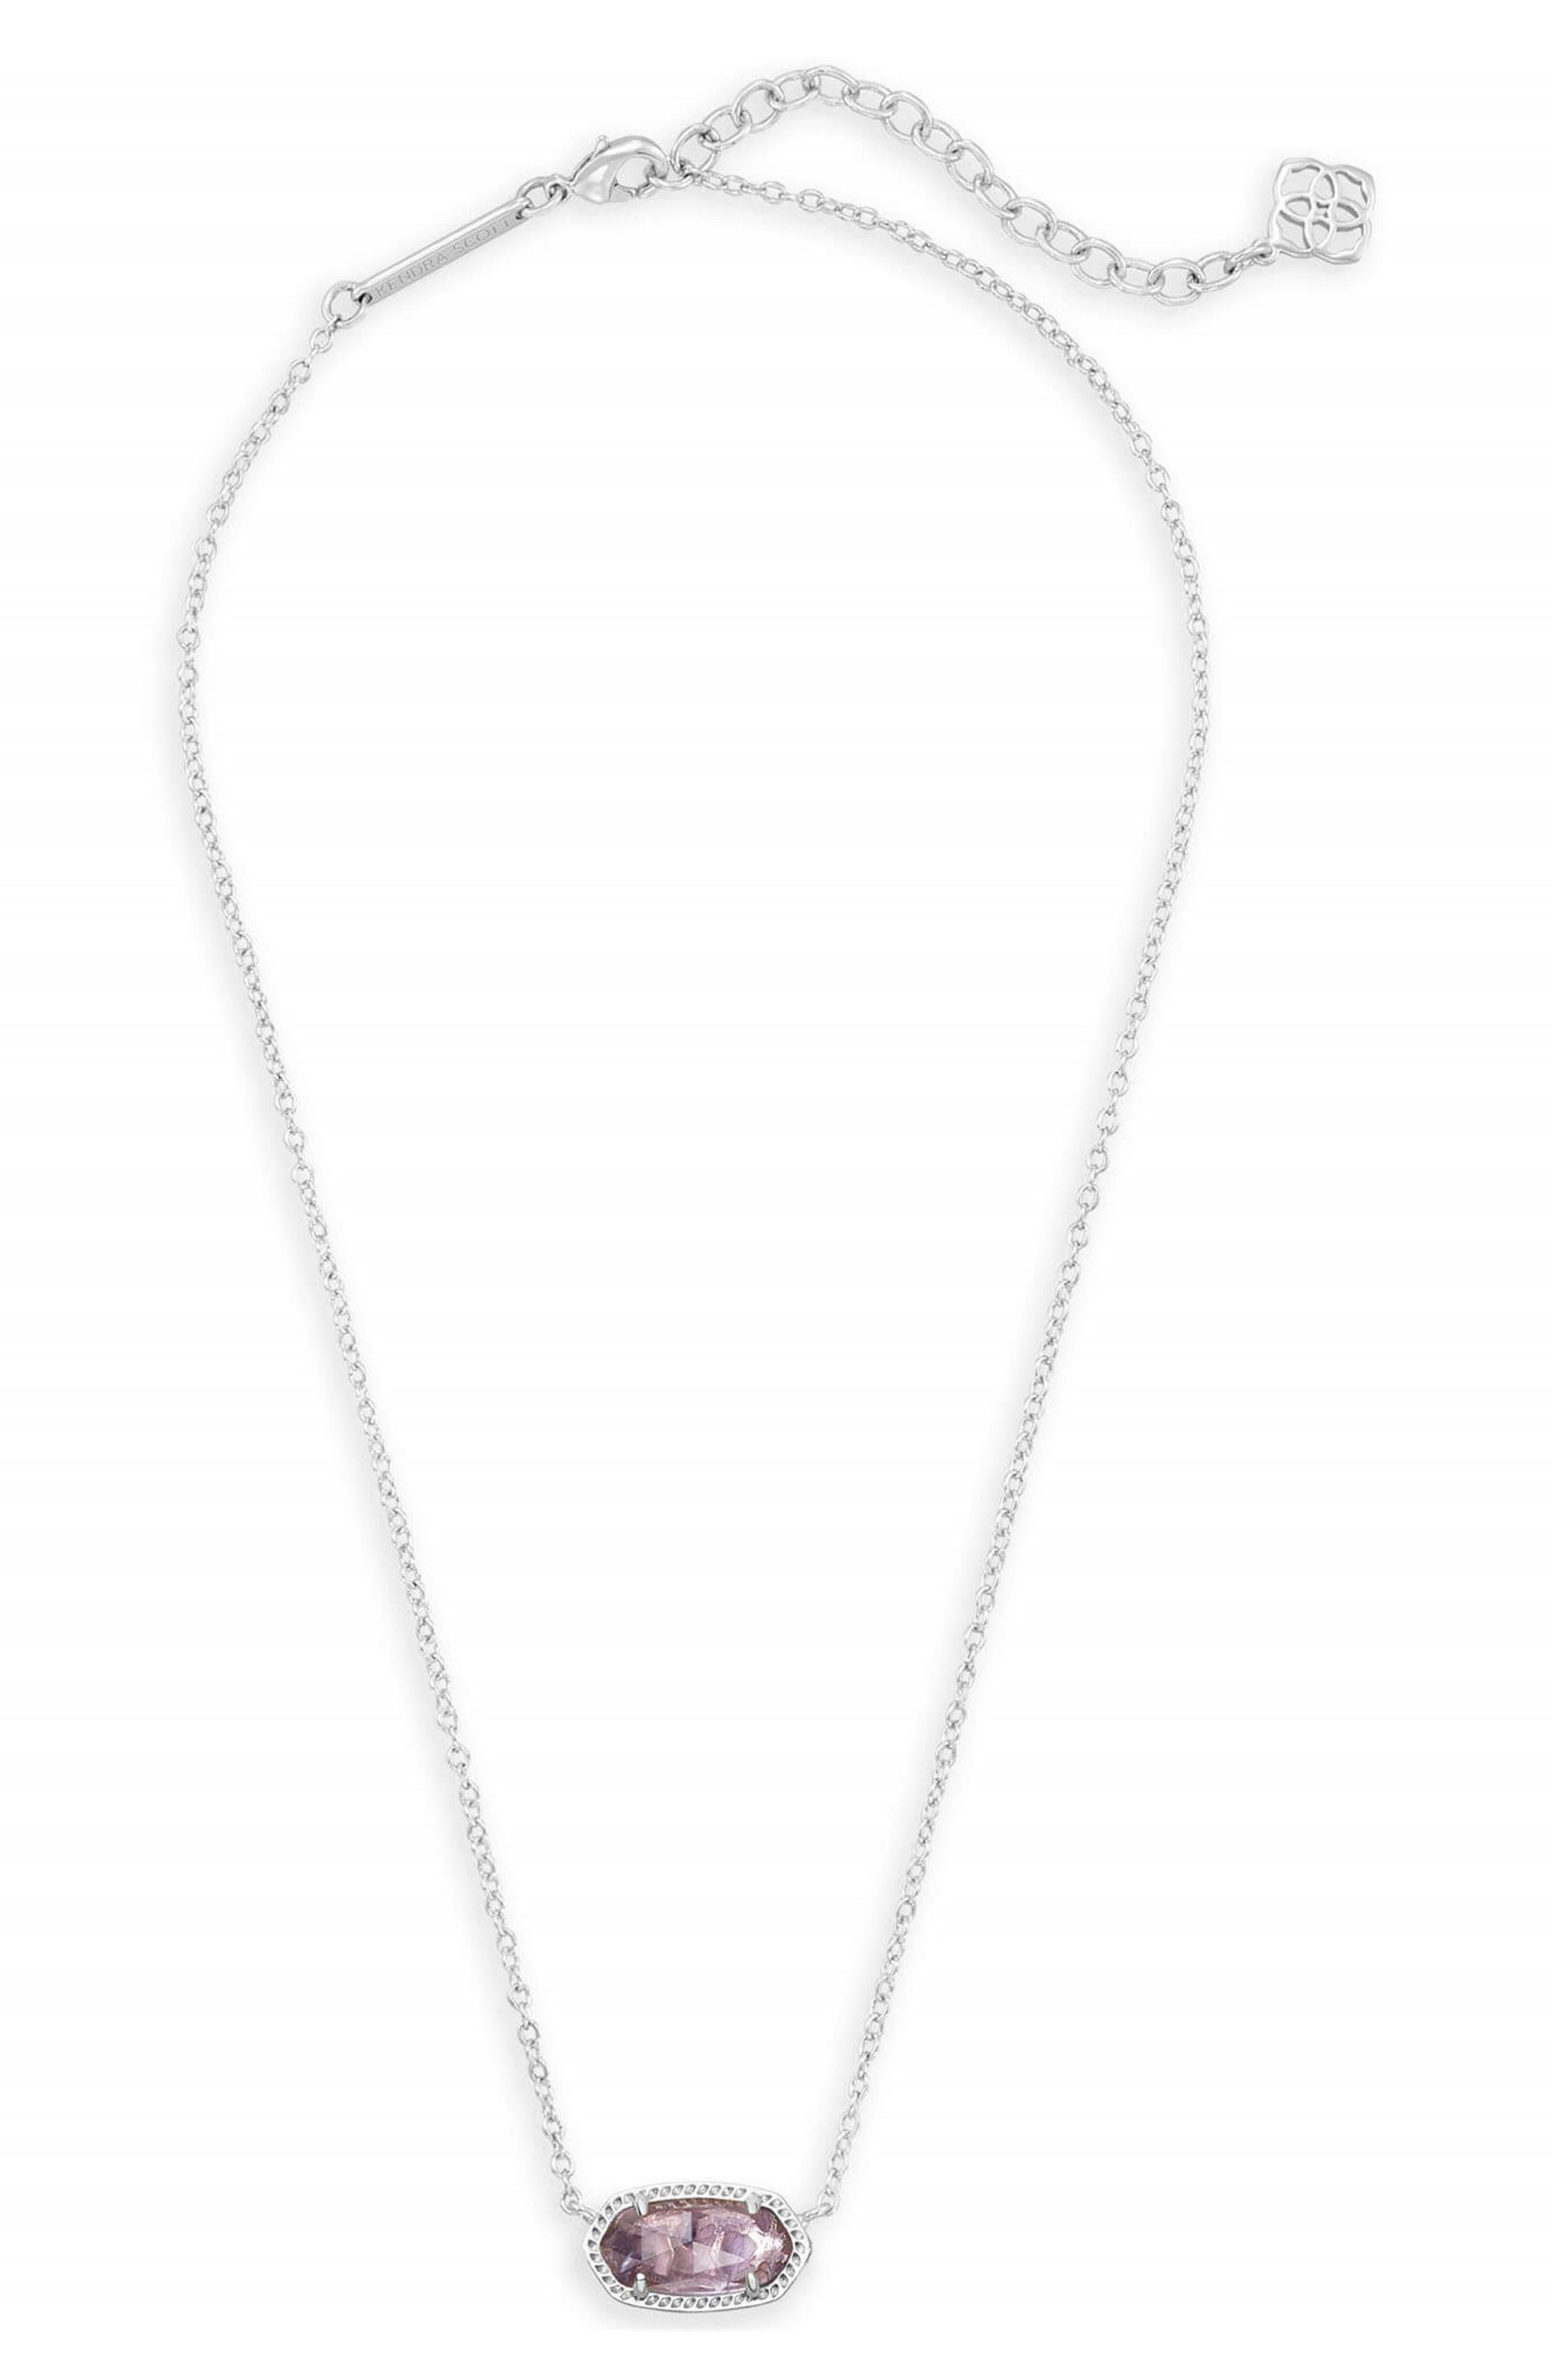 KENDRA SCOTT, Elisa Birthstone Pendant Necklace, Main thumbnail 1, color, FEBRUARY/AMETHYST/SILVER